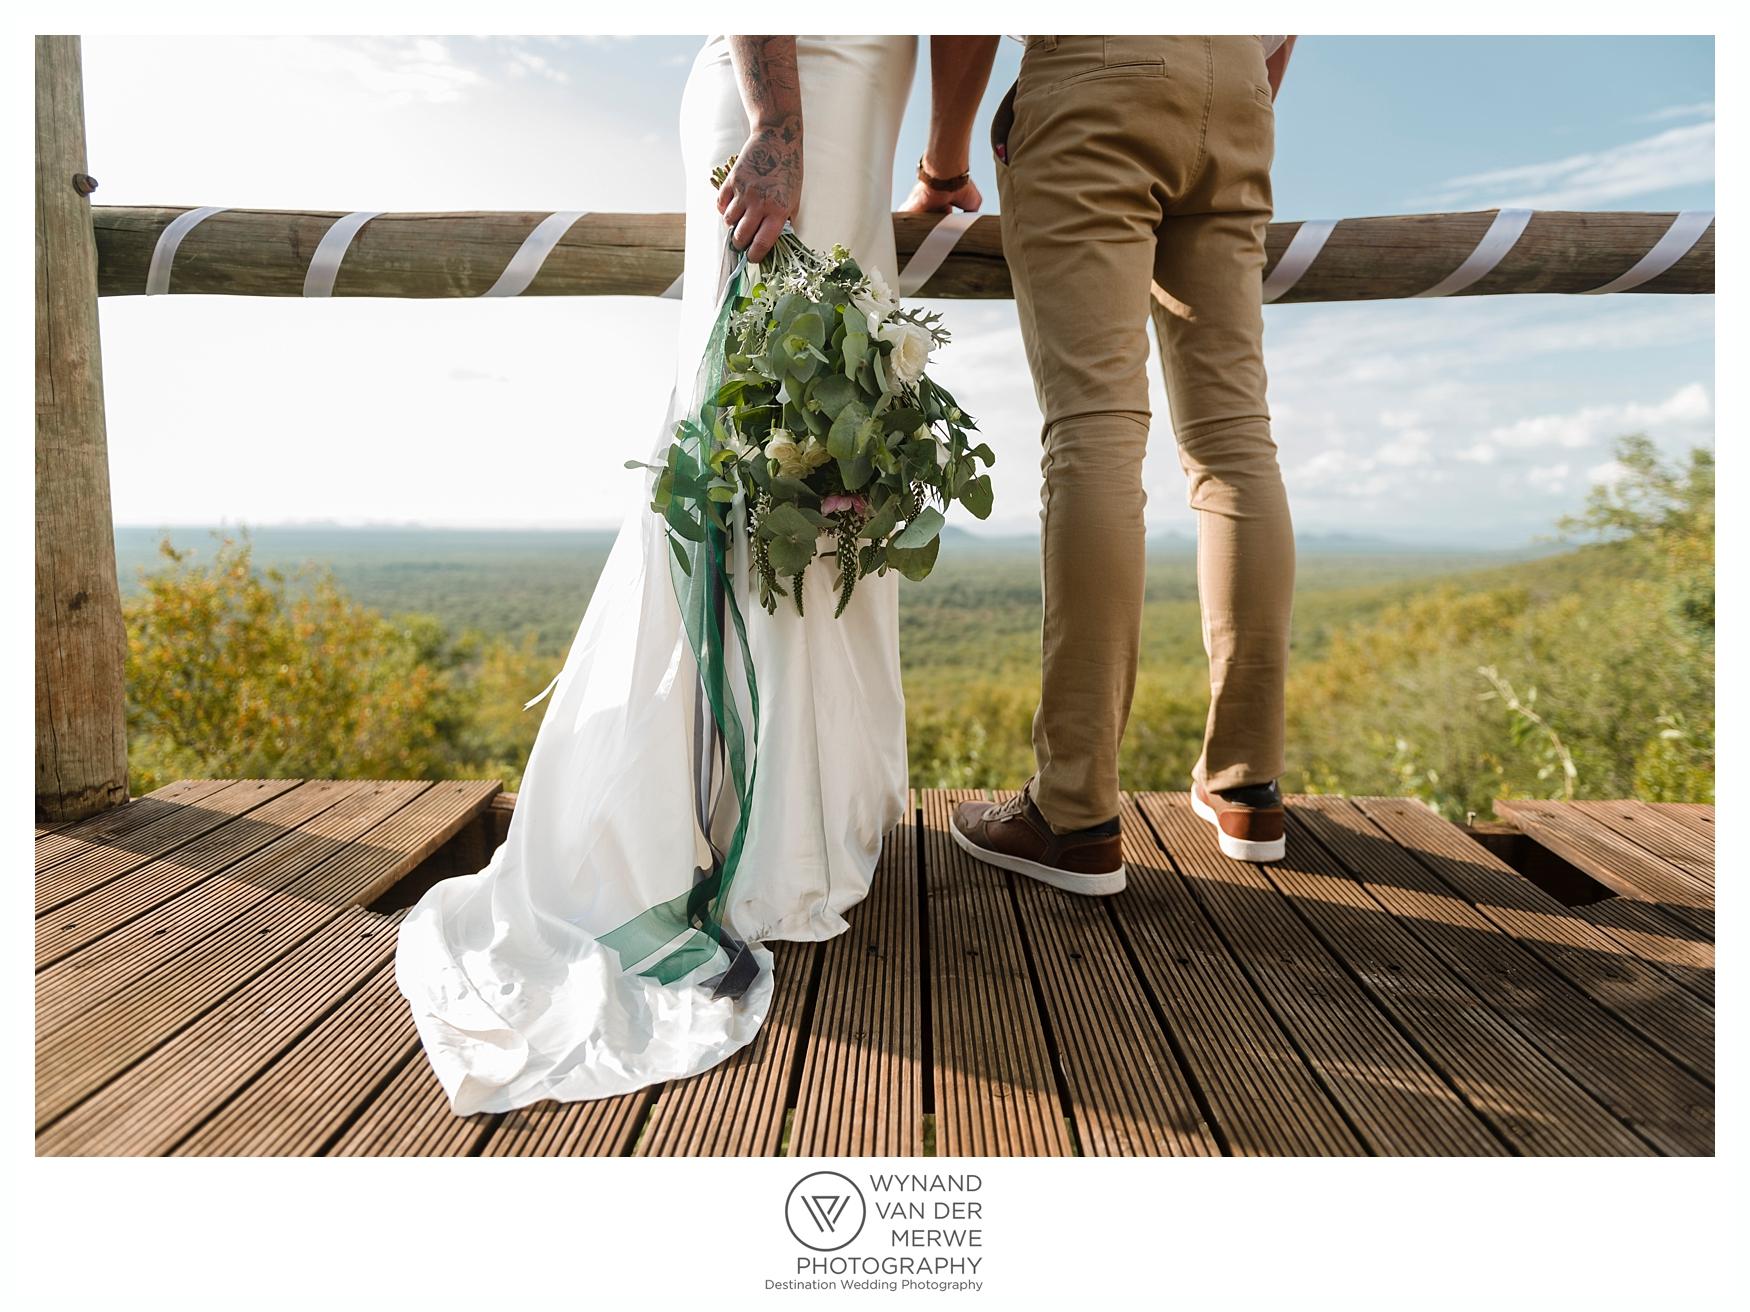 WynandvanderMerwe_weddingphotography_bushveldwedding_northam_bushveld_limpopowedding_limpopo_southafrica-142.jpg